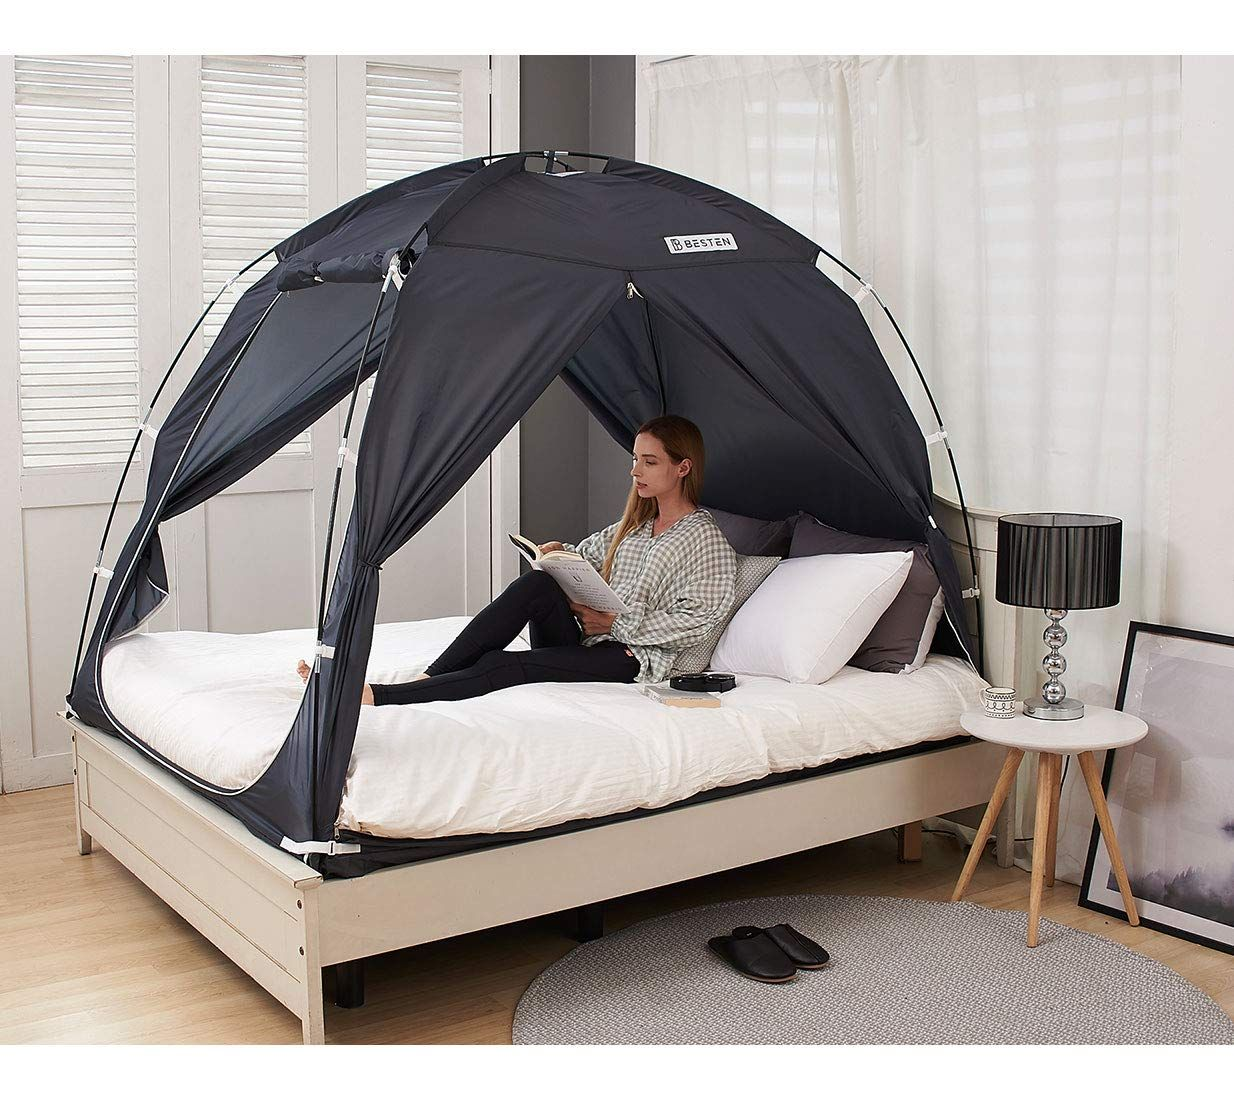 BESTEN Floorless Indoor Privacy Tent on Bed for Warm and